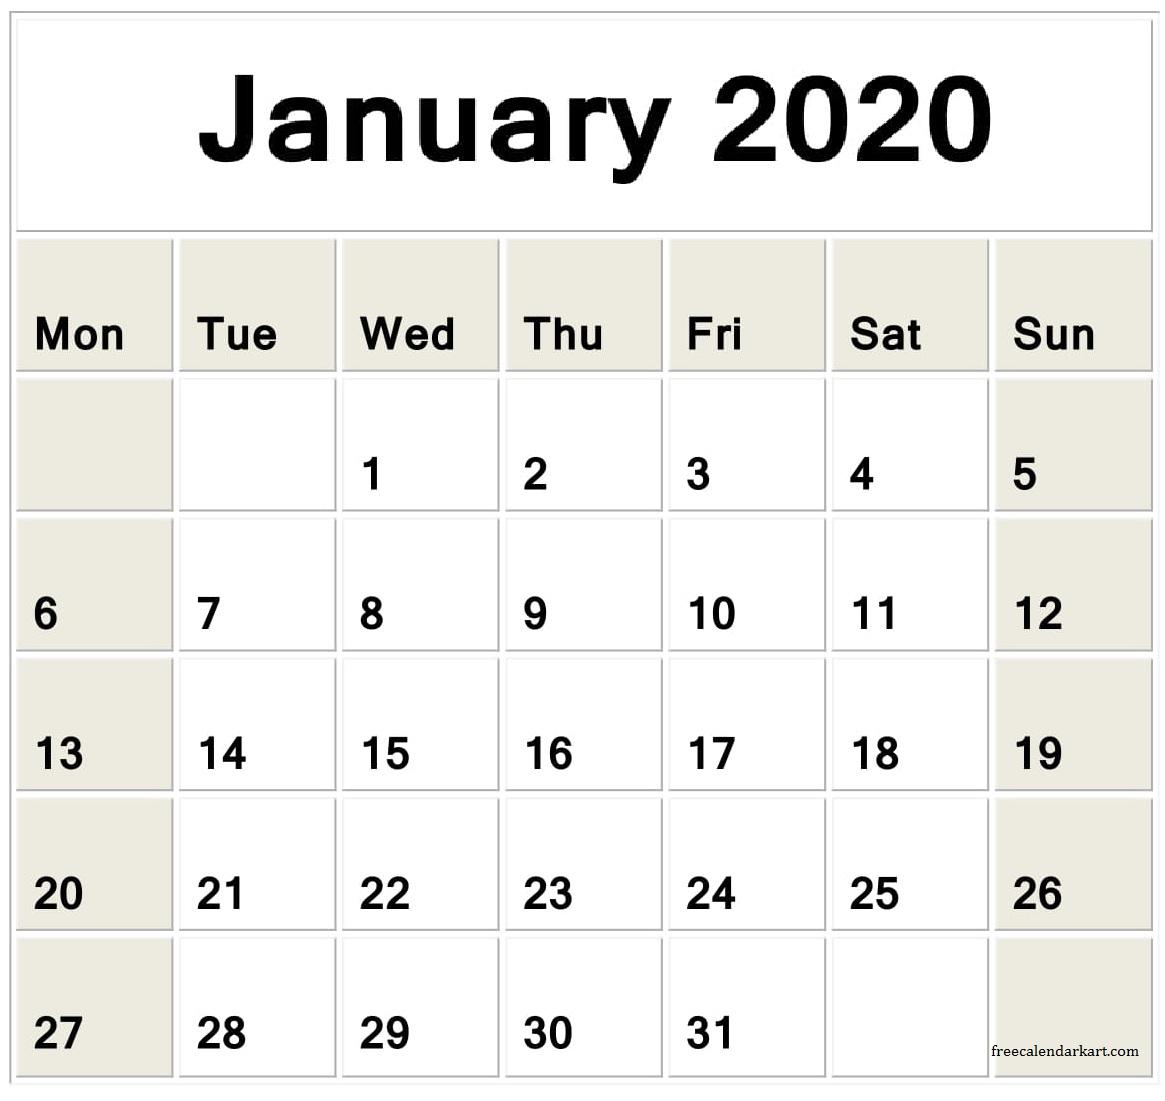 Jan 2020 Calendar Printable Planner - Latest Printable